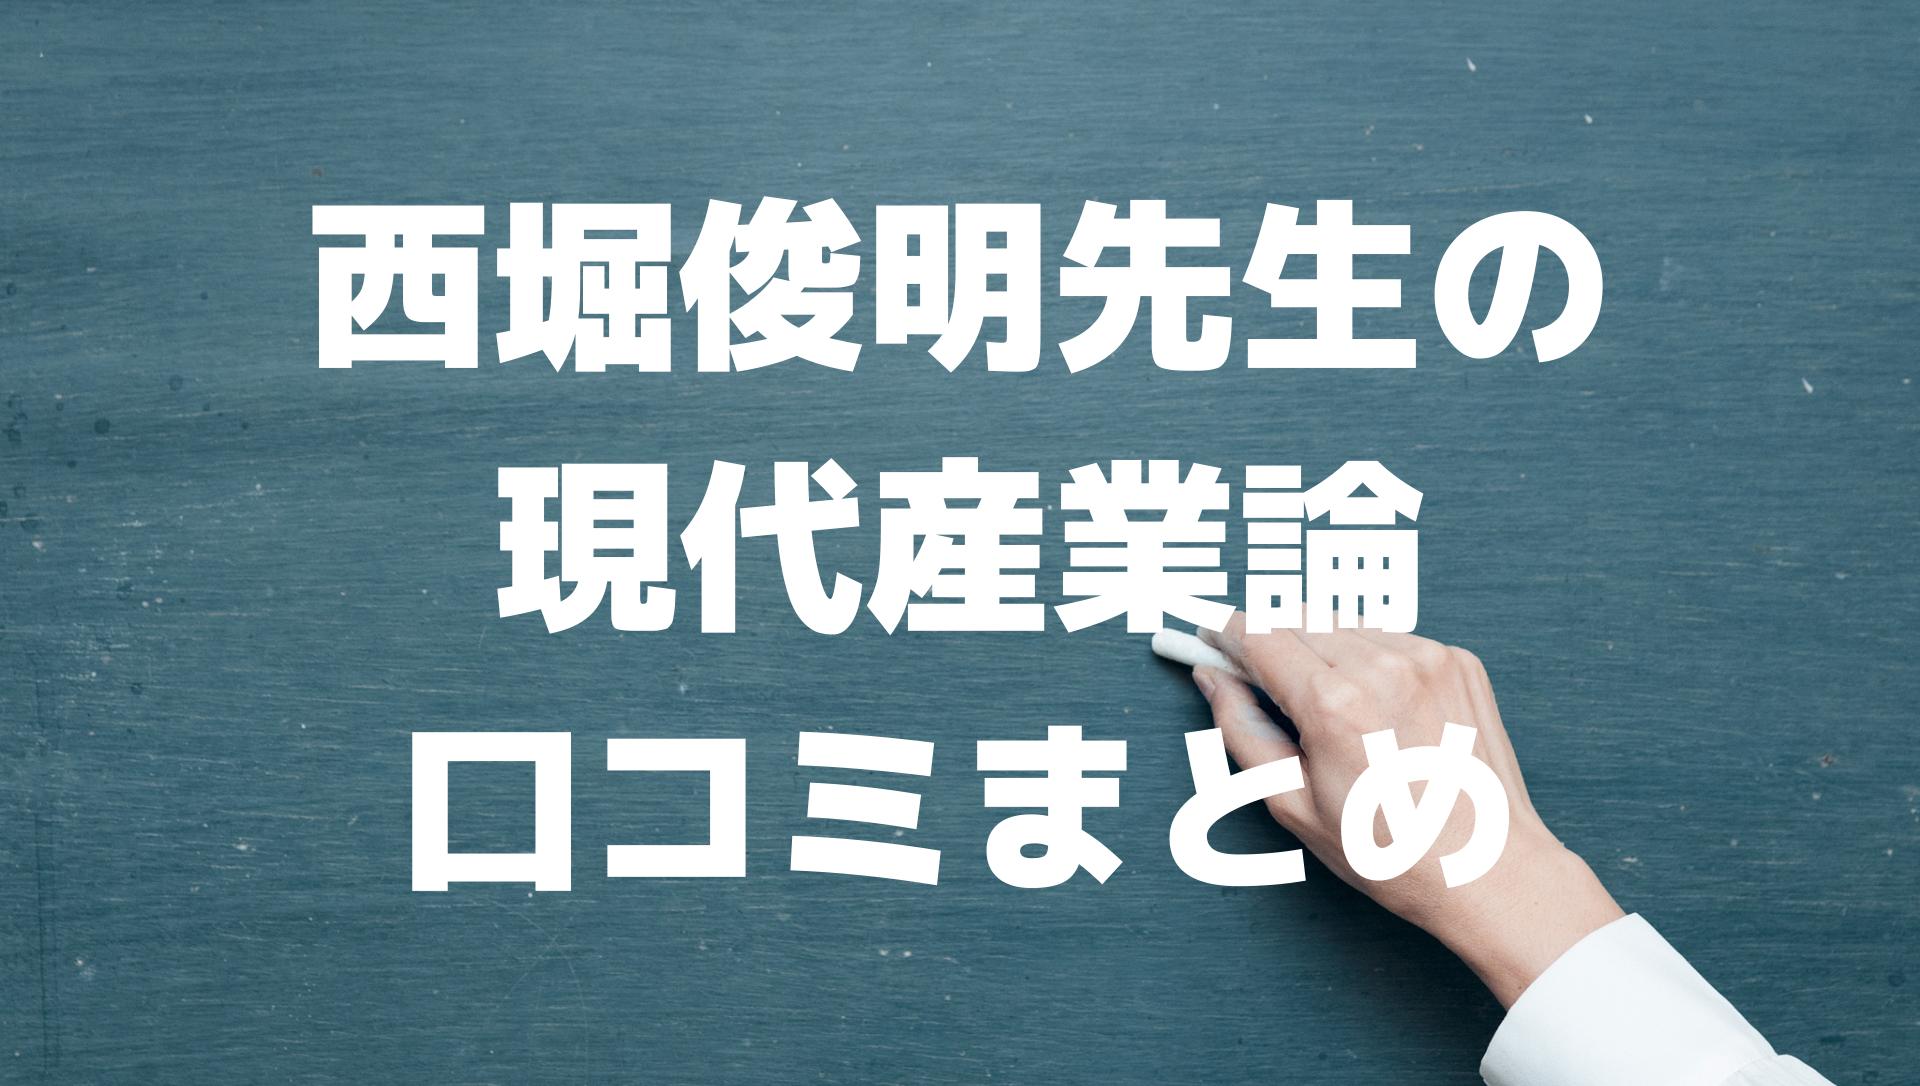 西堀俊明先生の現代産業論